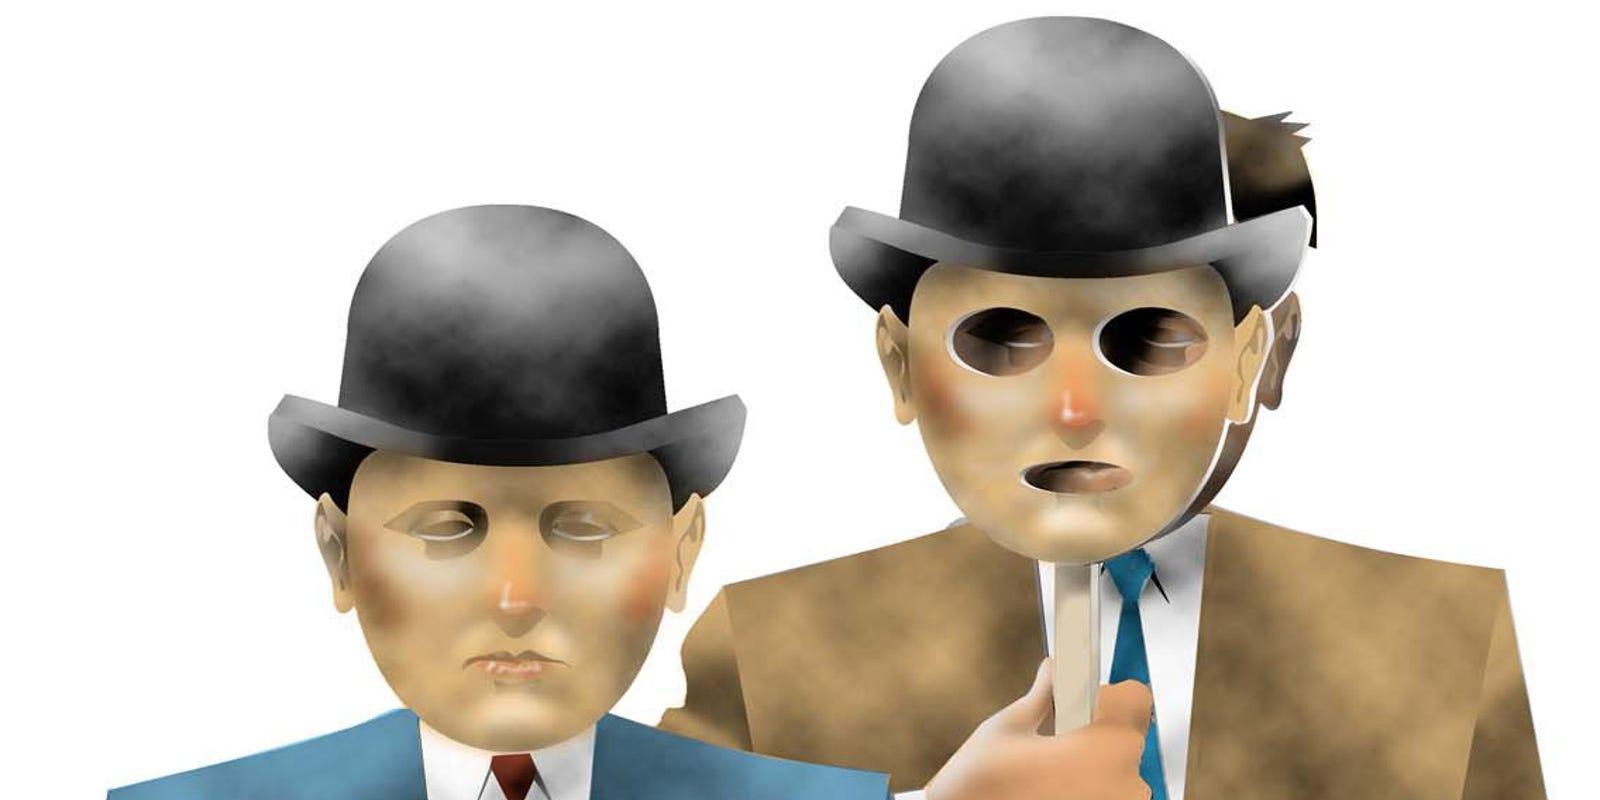 Social media scams skyrocket during the COVID-19 crisis